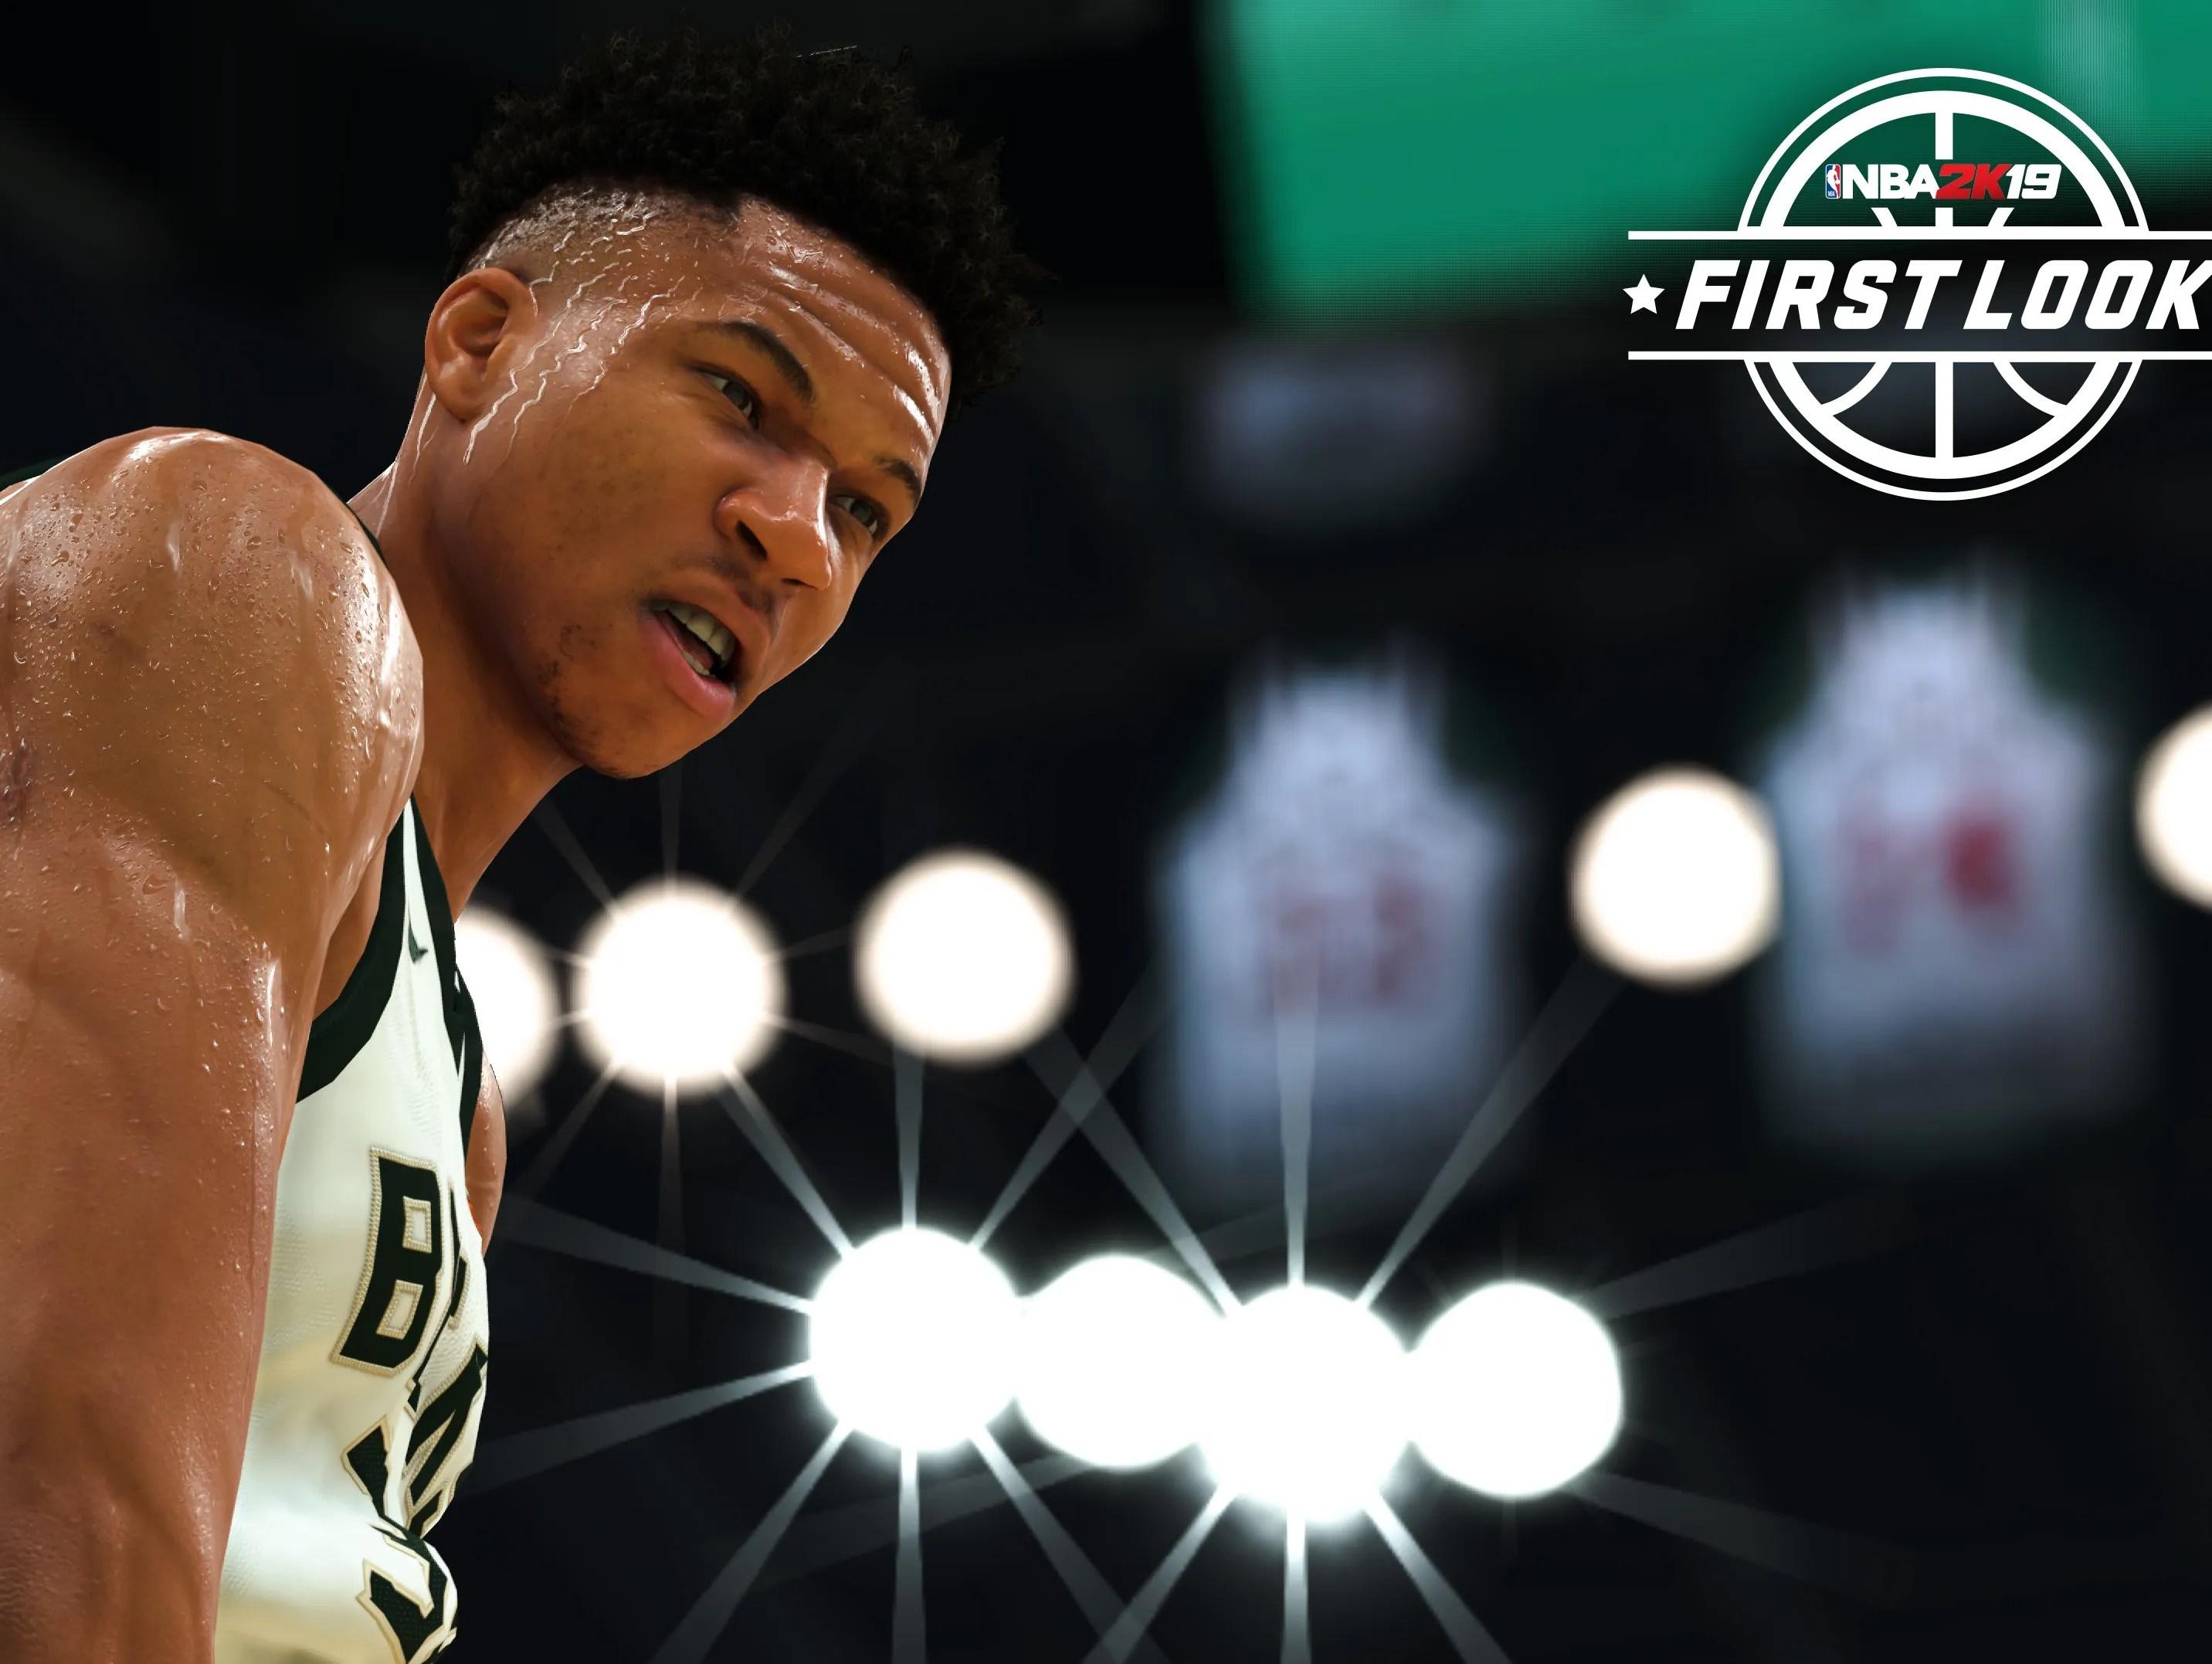 Bucks Giannis Antetokounmpo Is NBA 2K19 Video Game Cover Star